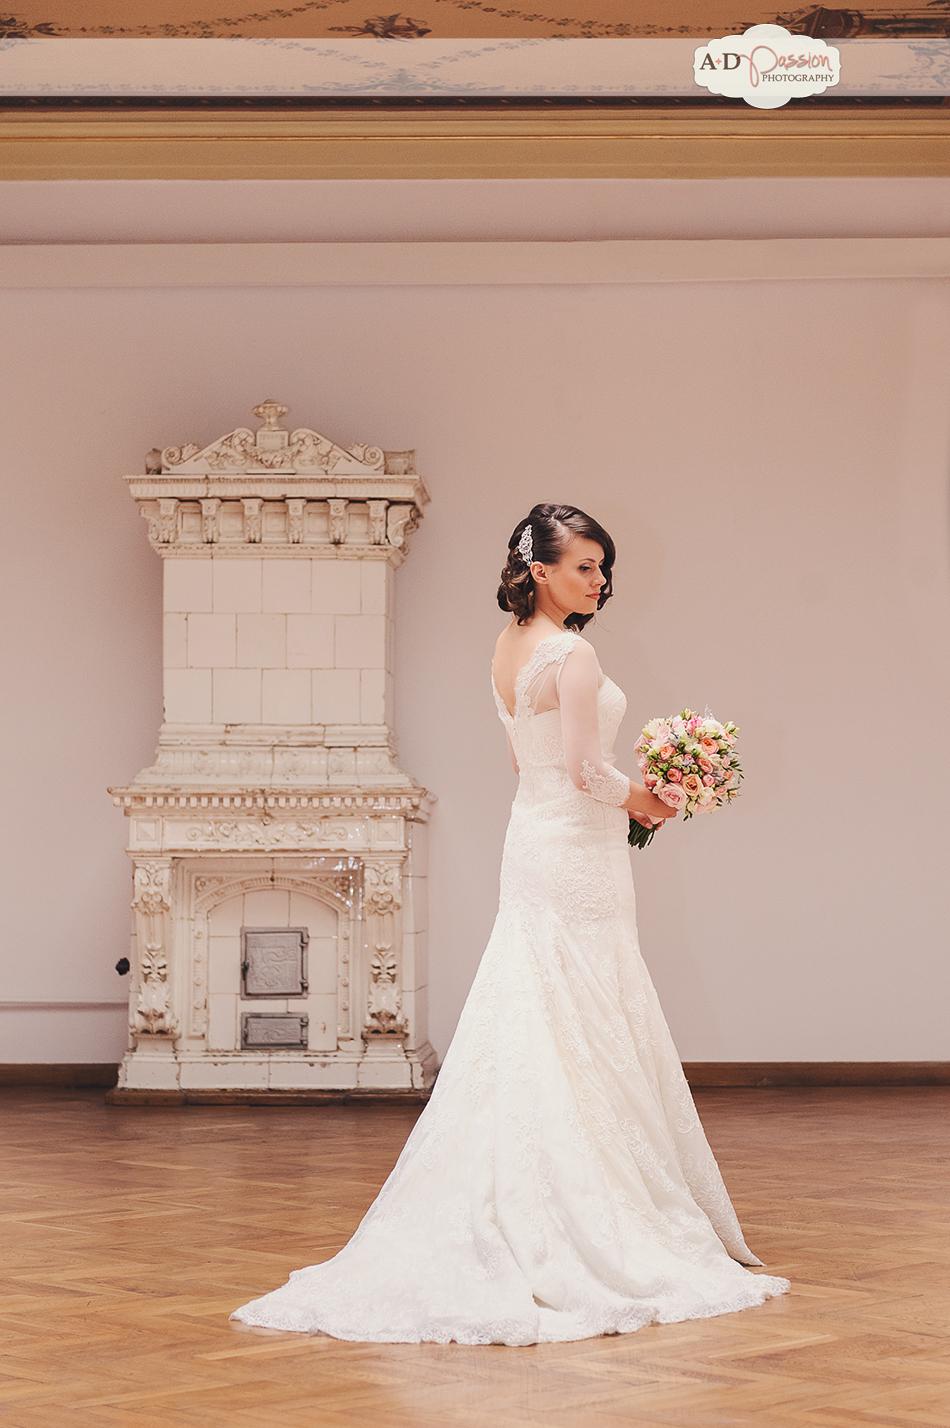 AD Passion Photography | 20130825_fotograf-nunta-vintage_octavian-simina_0111 | Adelin, Dida, fotograf profesionist, fotograf de nunta, fotografie de nunta, fotograf Timisoara, fotograf Craiova, fotograf Bucuresti, fotograf Arad, nunta Timisoara, nunta Arad, nunta Bucuresti, nunta Craiova